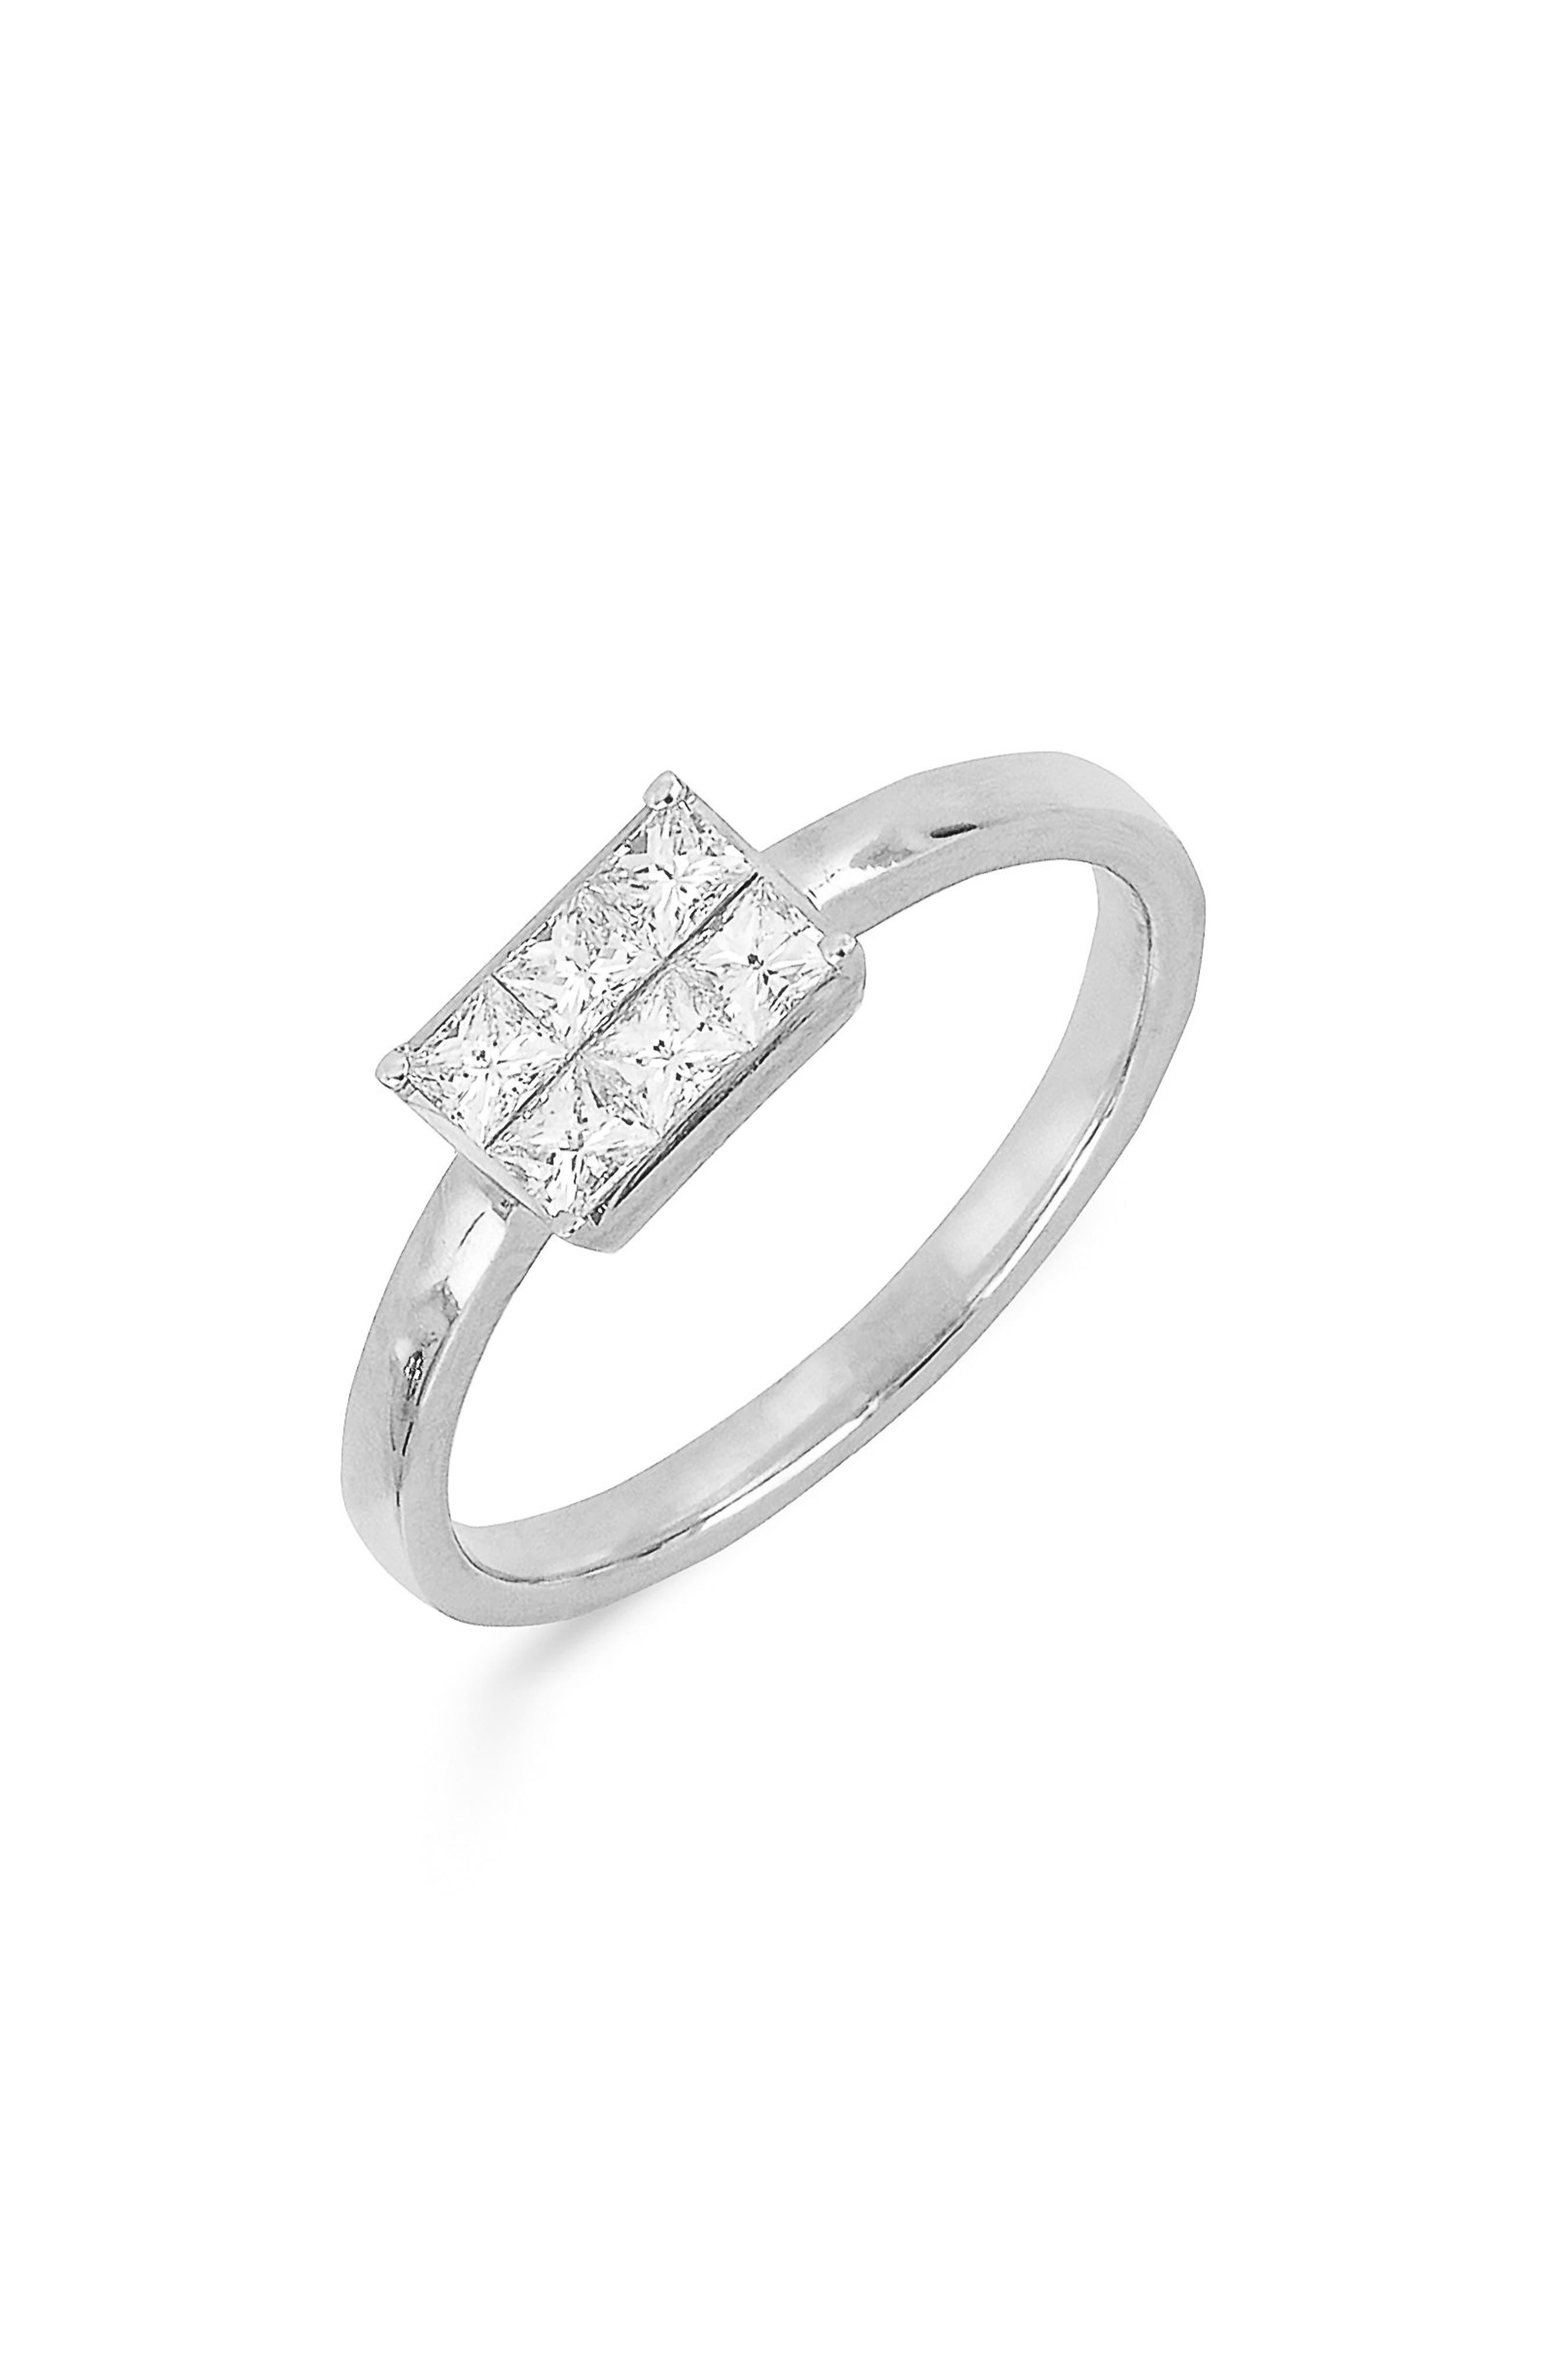 Princess Diamond Ring,                             Main thumbnail 1, color,                             WHITE GOLD